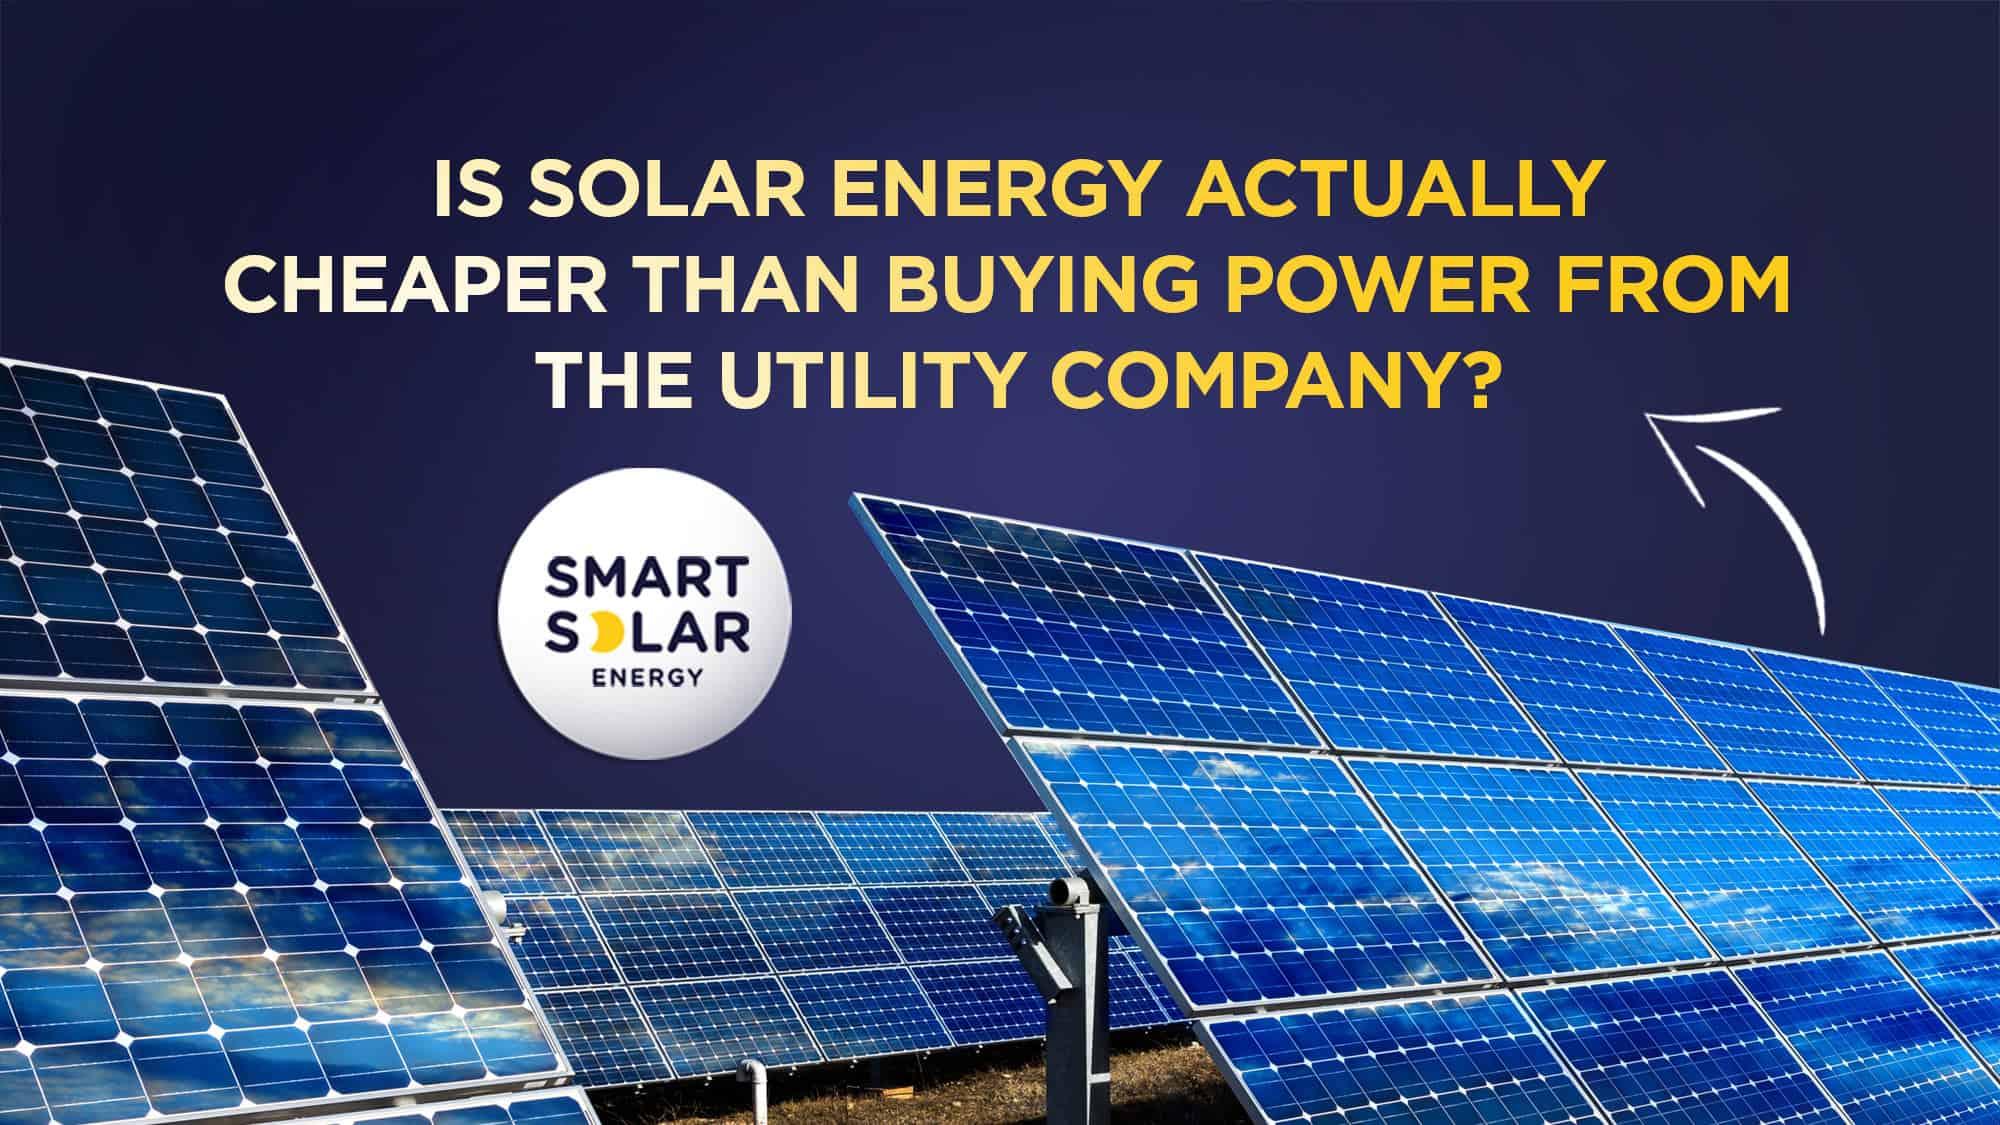 Is solar energy cheaper image